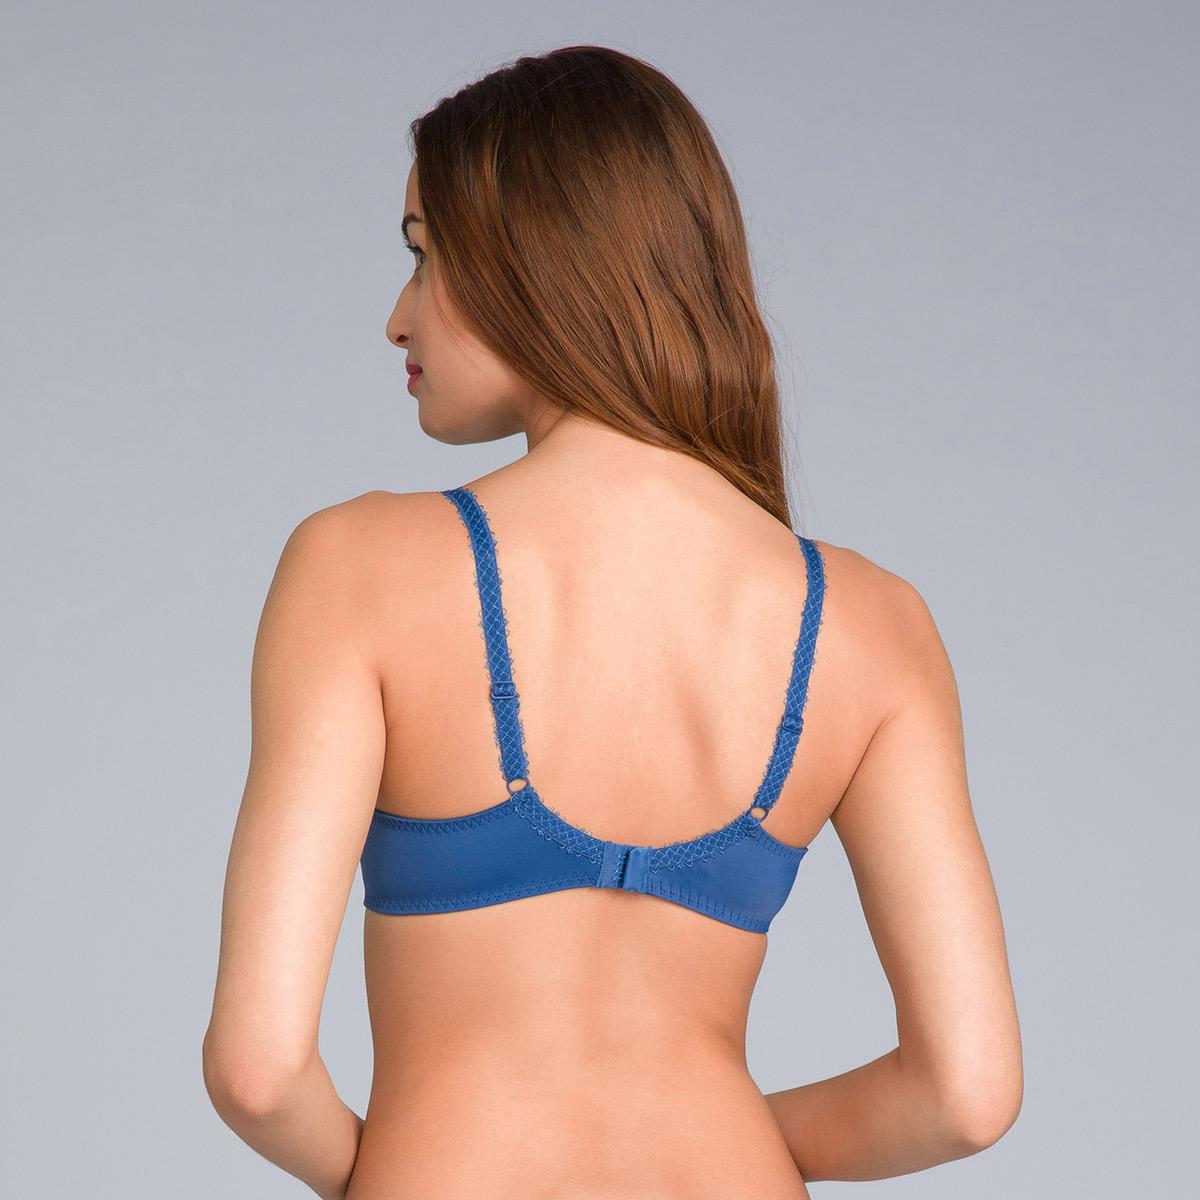 Reggiseno modellante in pizzo blu navy stampato - Flowery Lace Micro - PLAYTEX